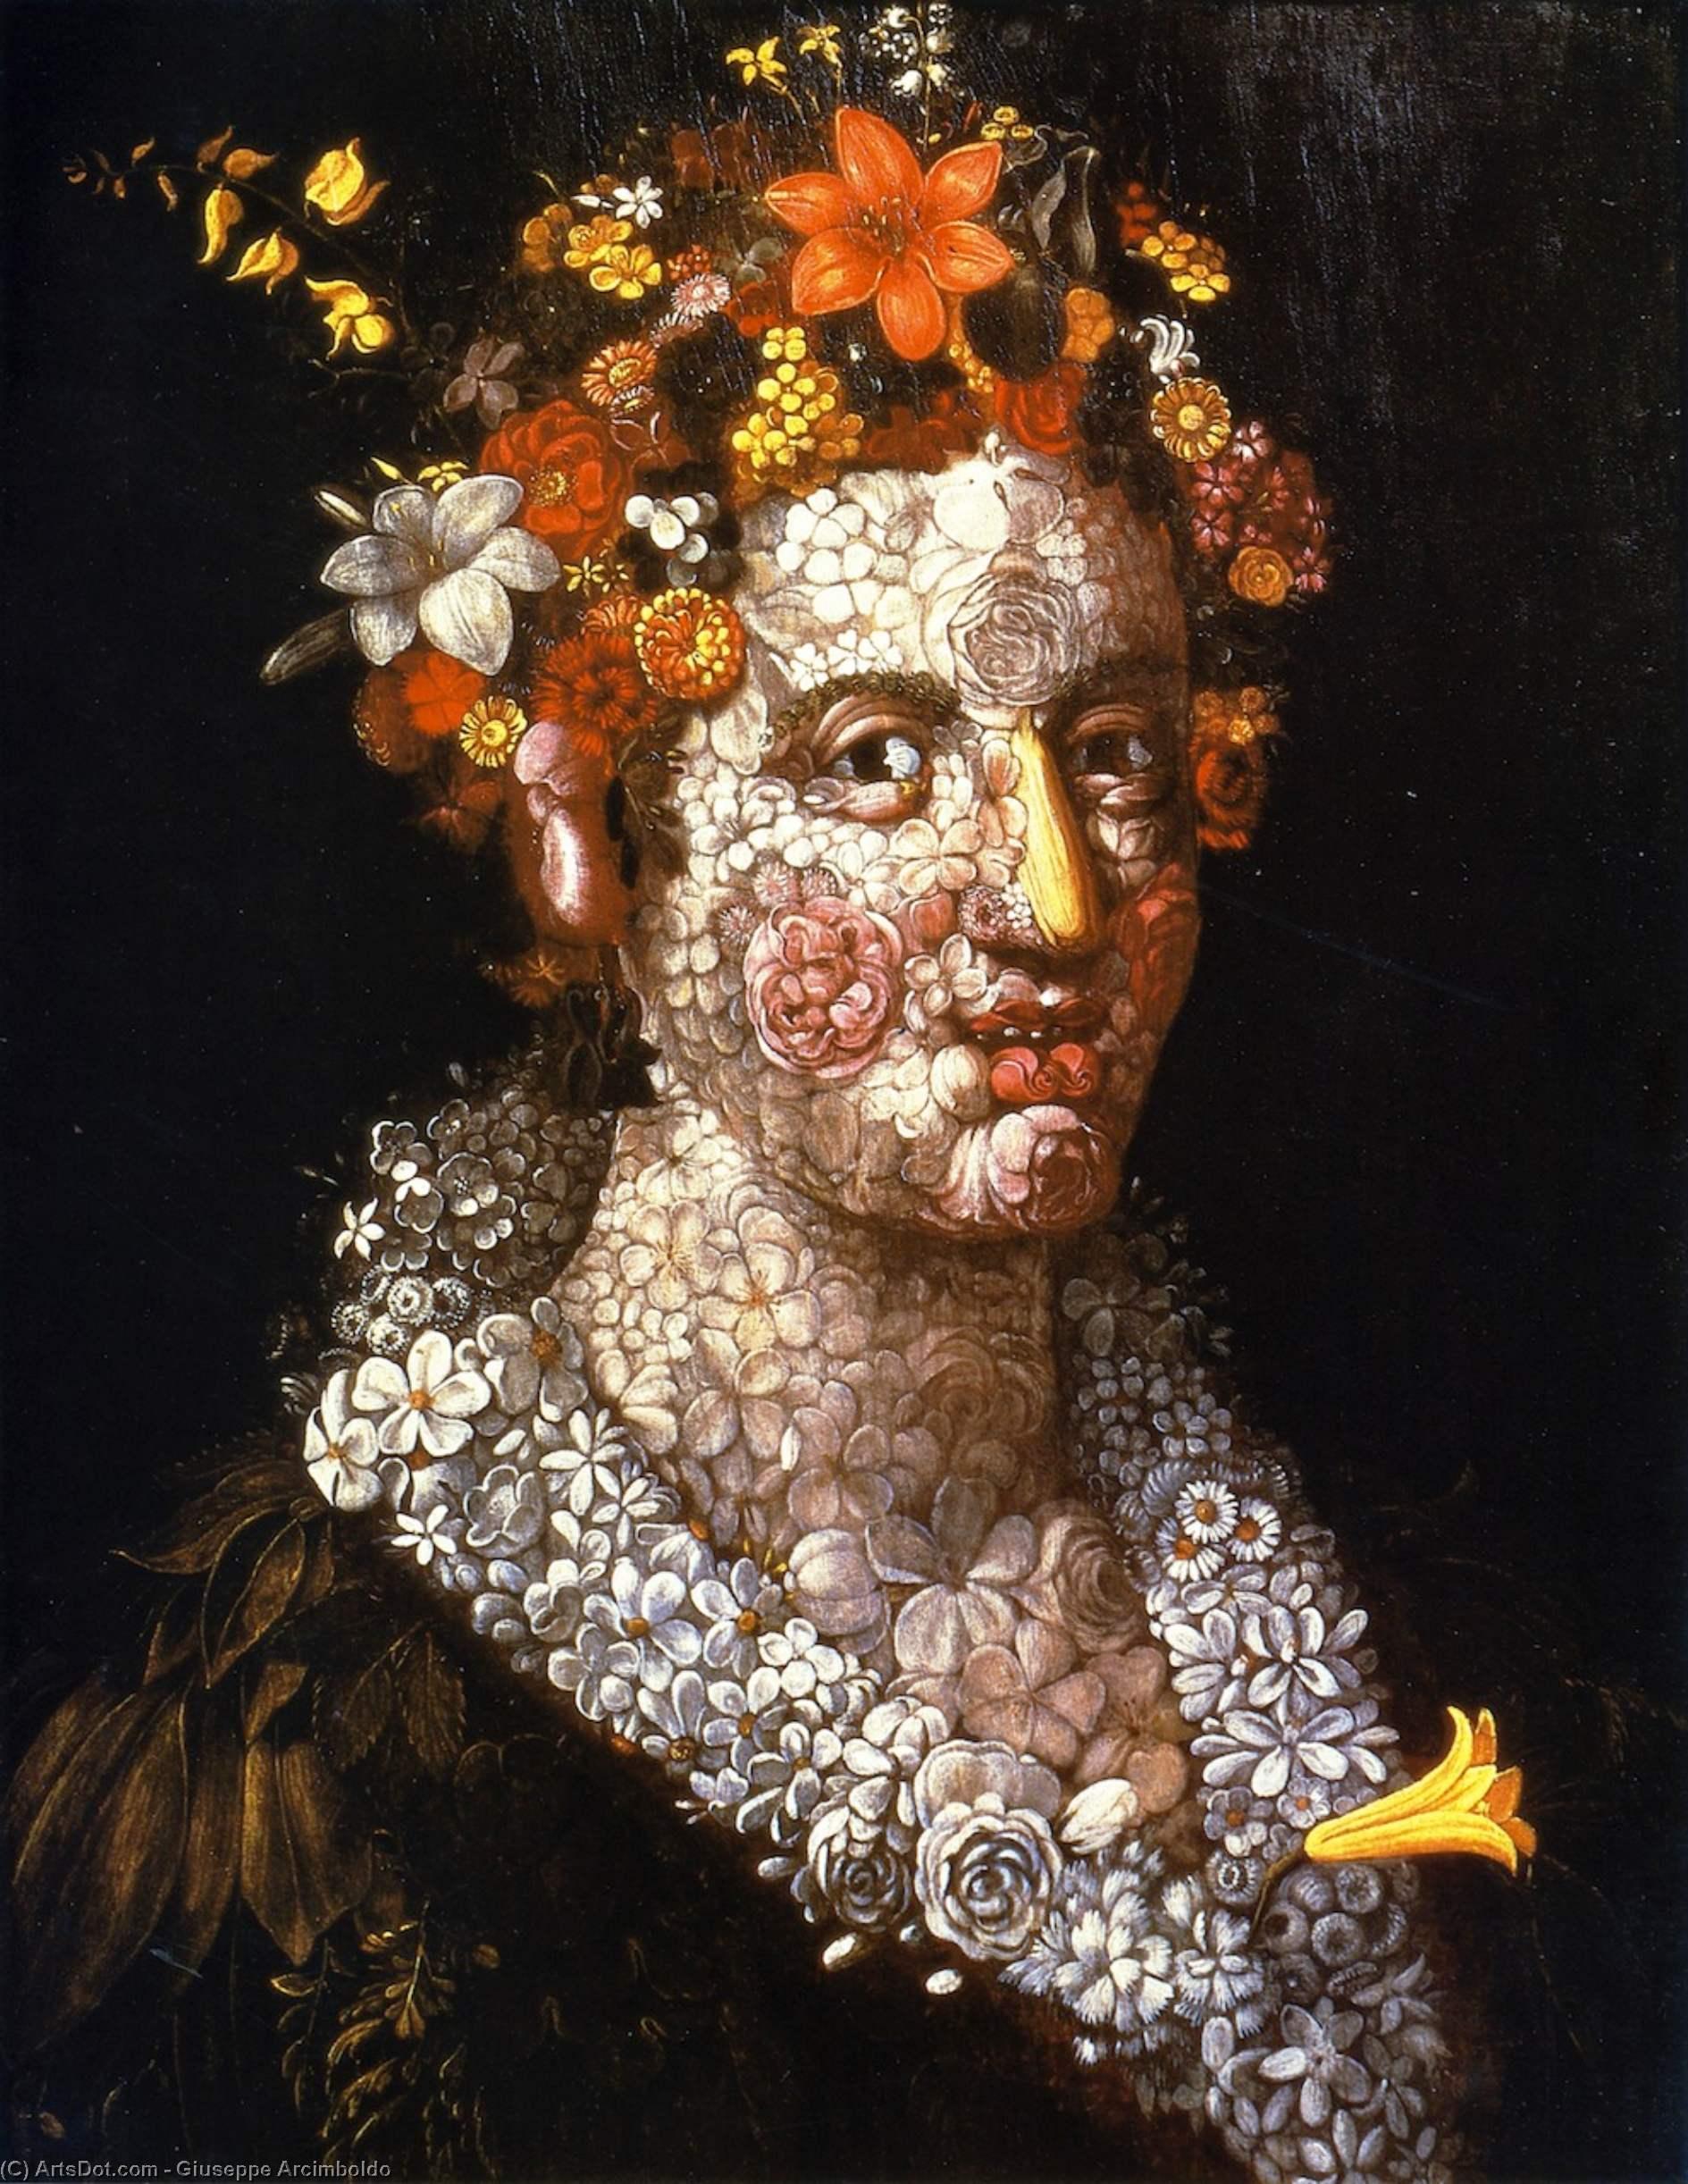 WikiOO.org - Encyclopedia of Fine Arts - Malba, Artwork Giuseppe Arcimboldo - Floral Still LIfe